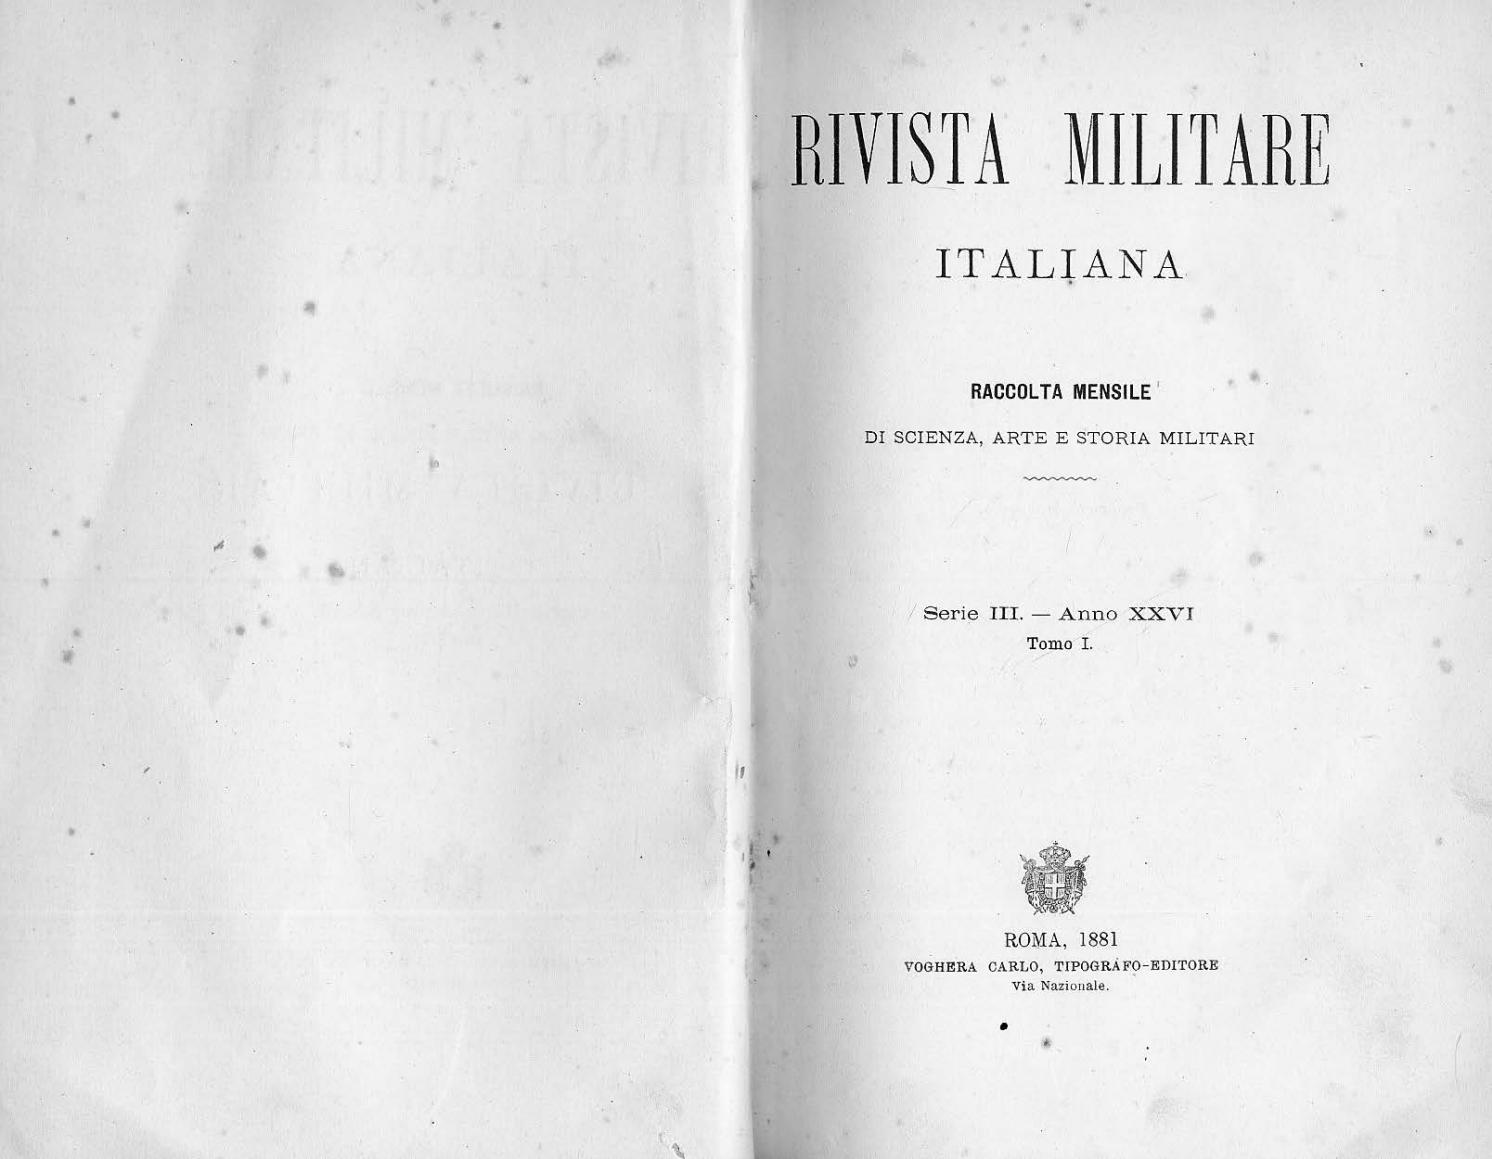 RIVISTA MILITARE 1881 TOMO I by Biblioteca Militare issuu